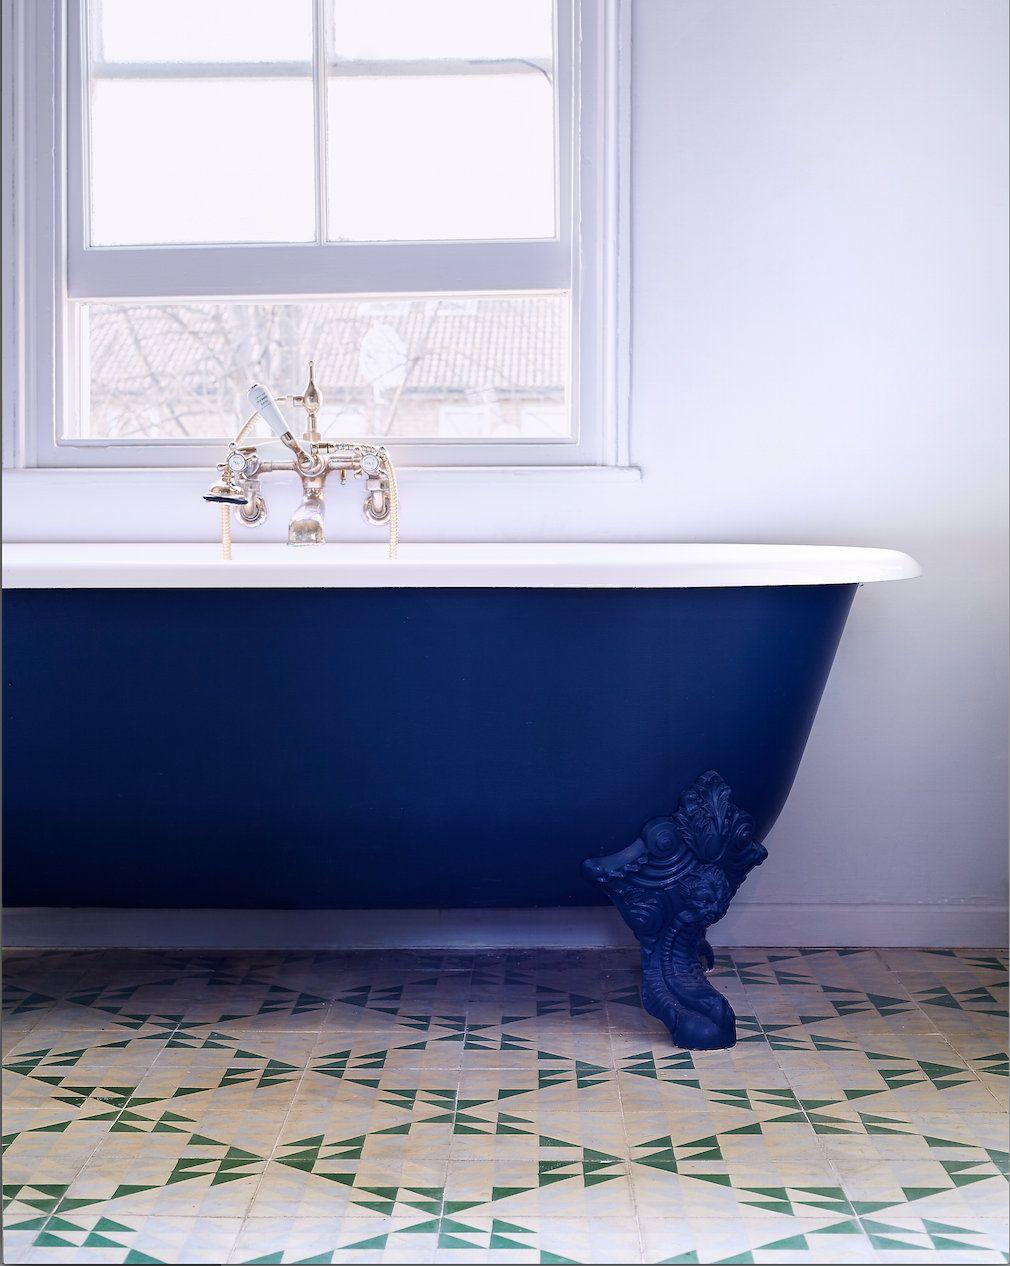 Bert Bathroom Stall bert & may's majadas tile. http://www.bertandmay/majadas?id